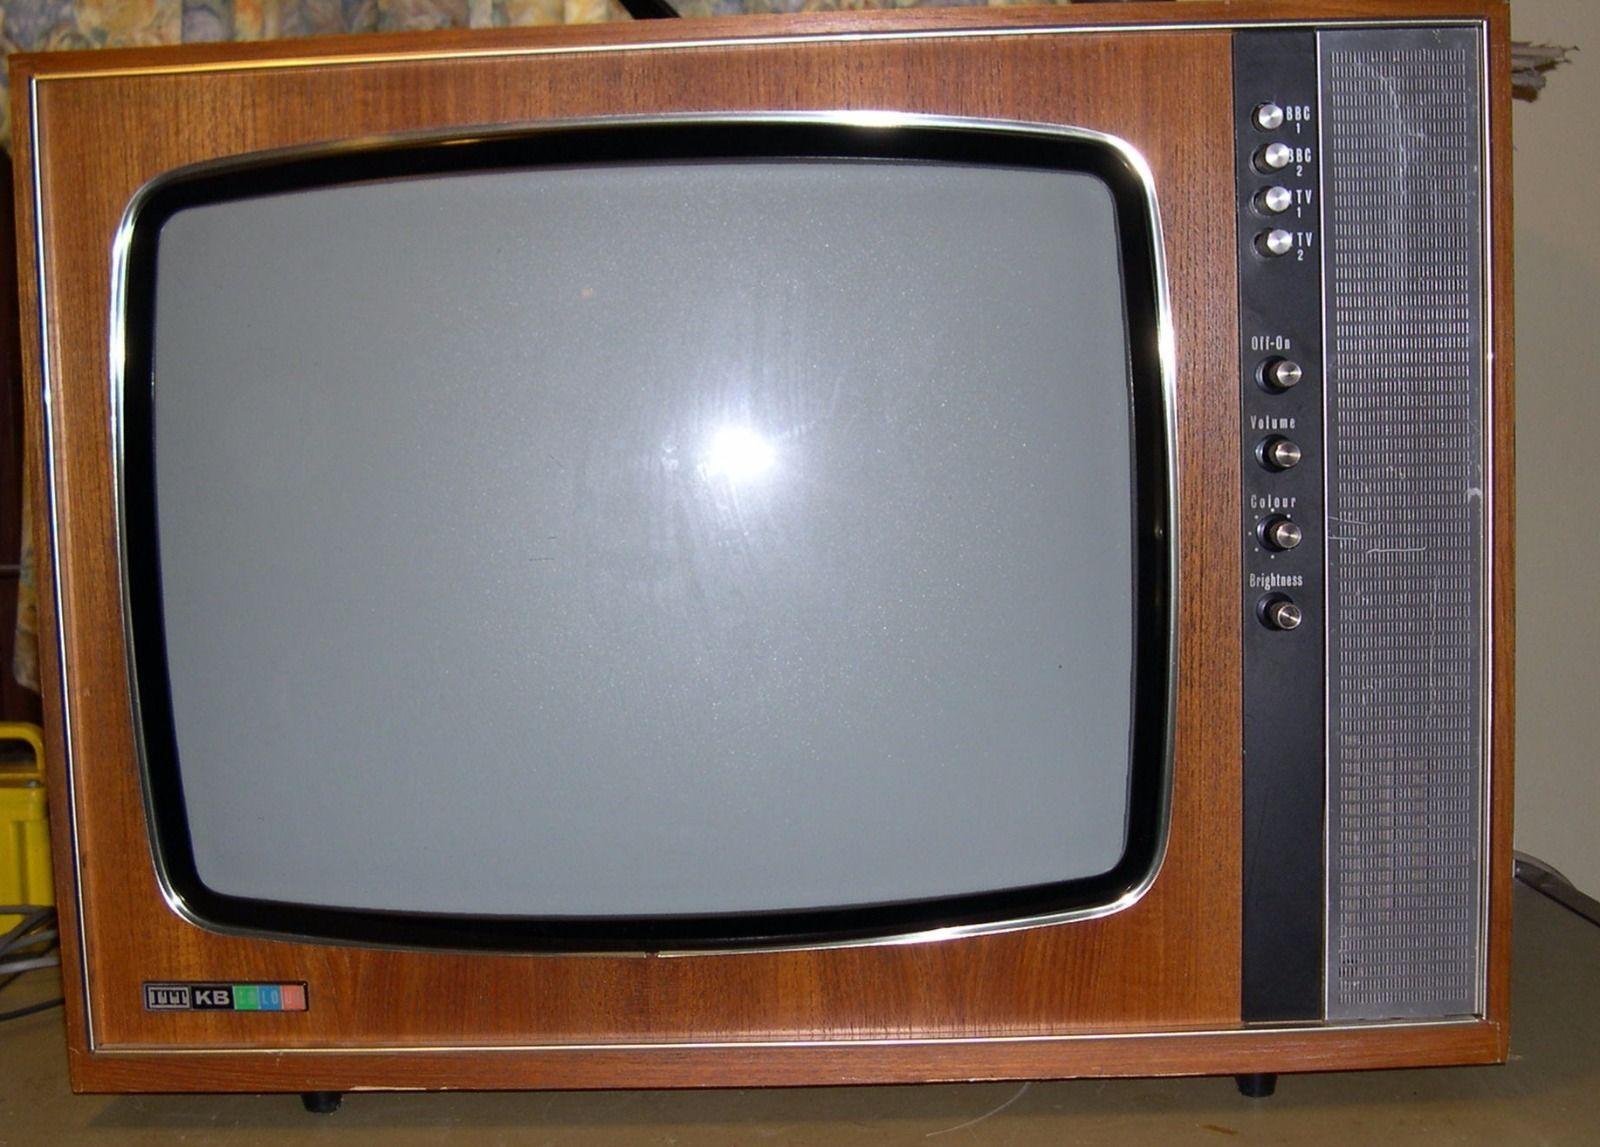 itt kb cvc2 colour tv from 1969 very rare vintage. Black Bedroom Furniture Sets. Home Design Ideas